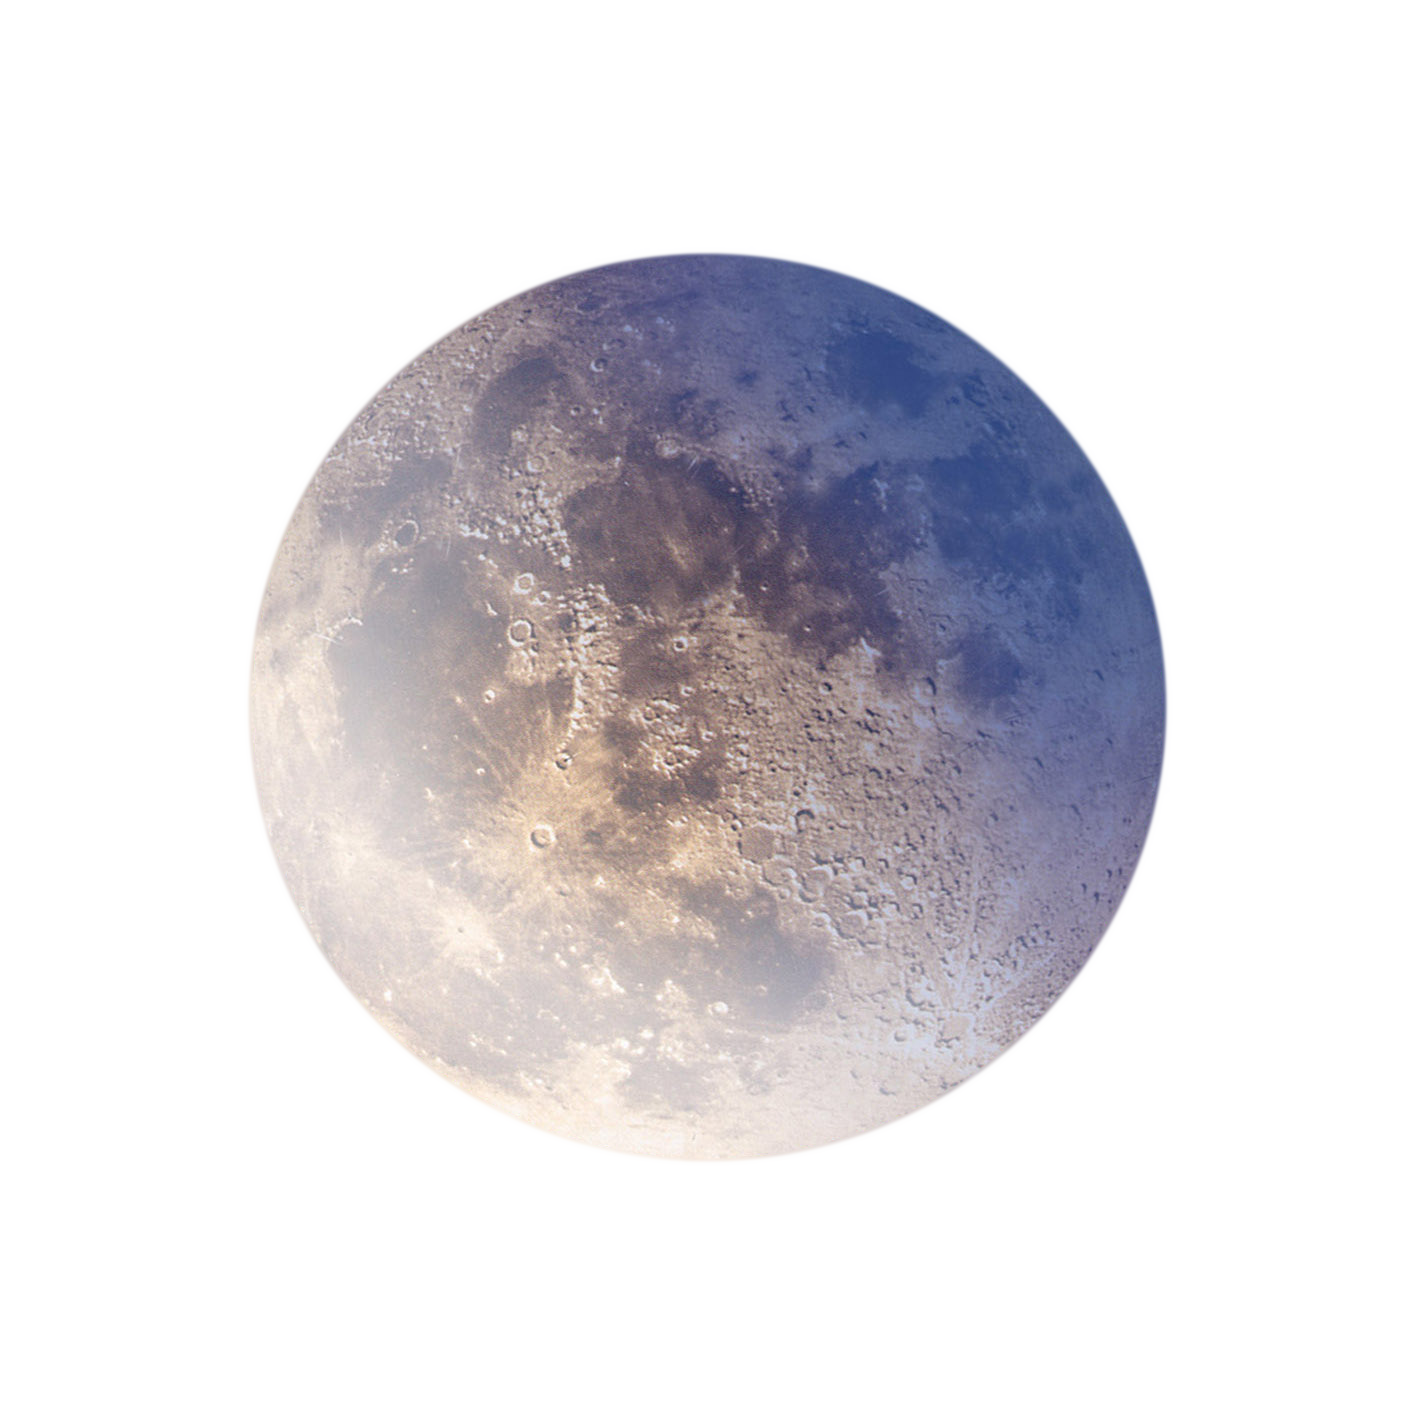 Realistic Moon PNG Image - PurePNG | Free transparent CC0 ...